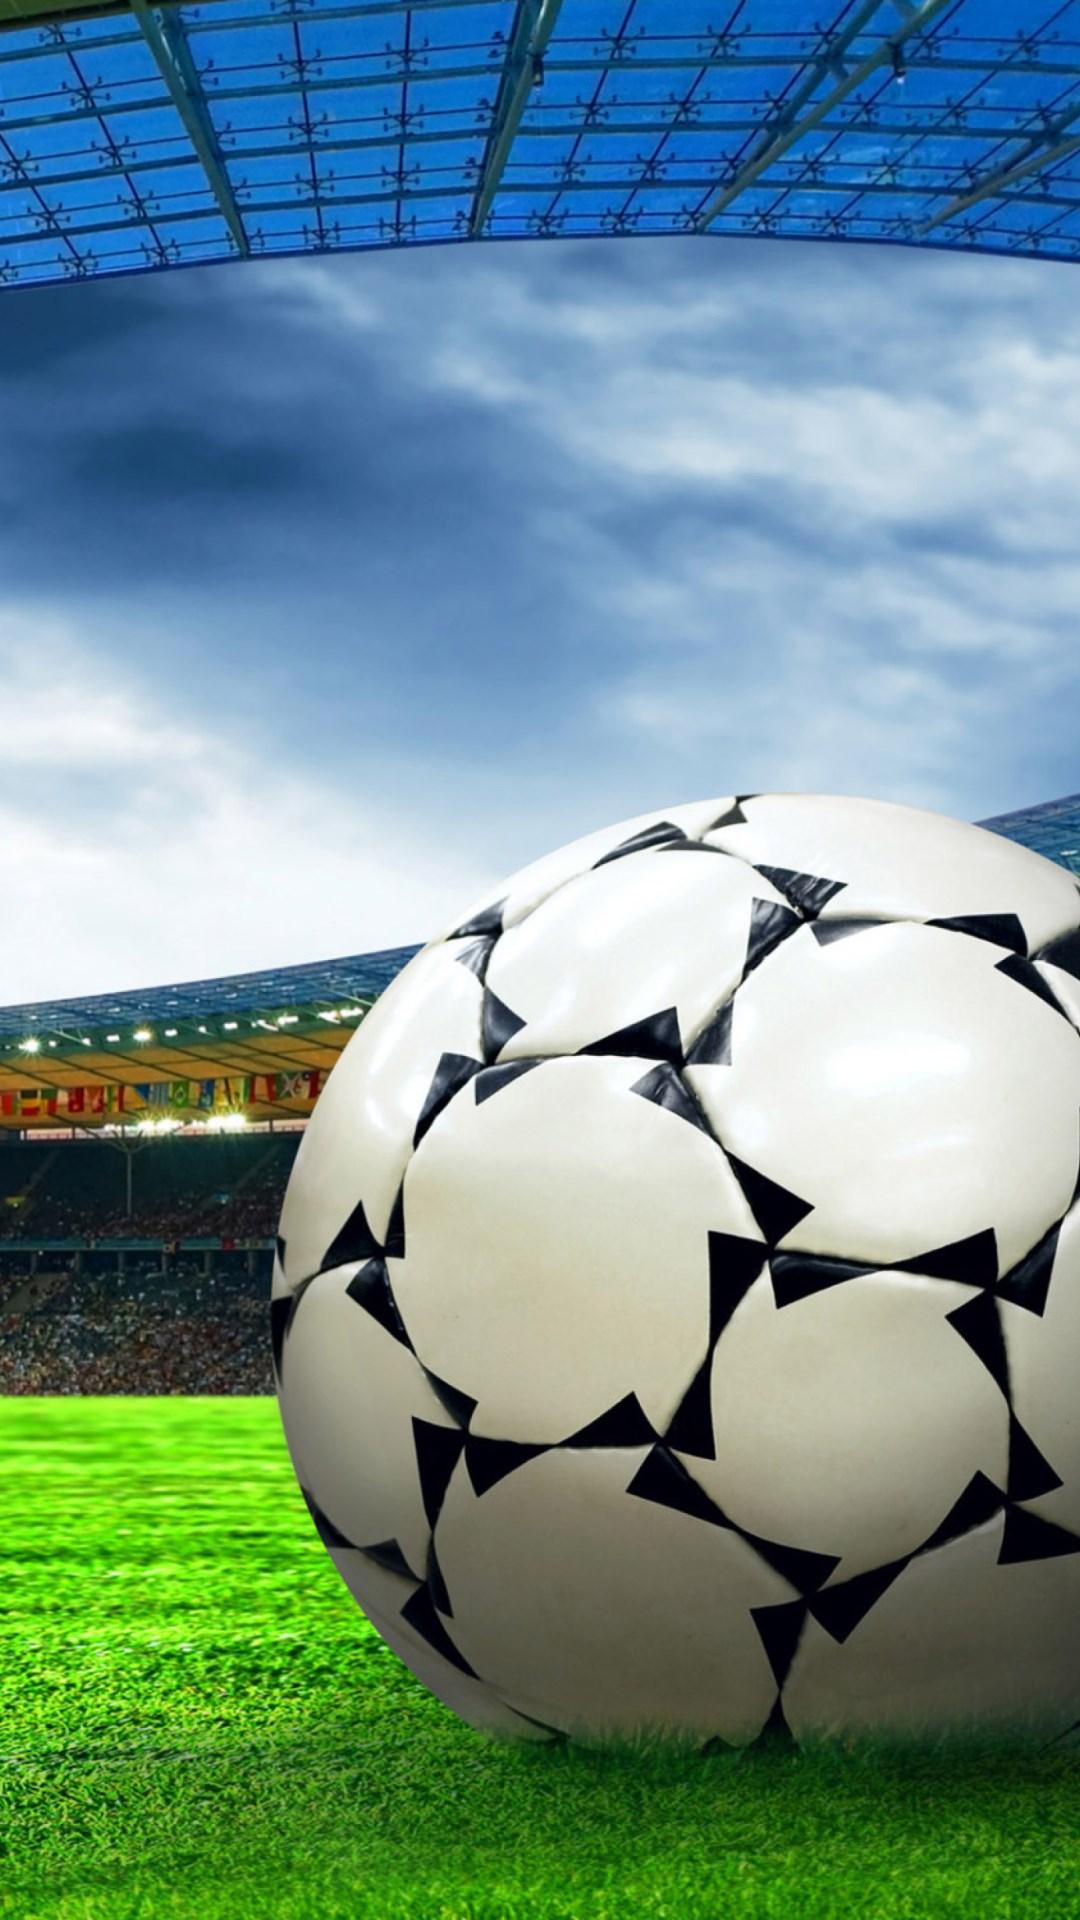 football-1080x1920-wallpaper-wp3405688